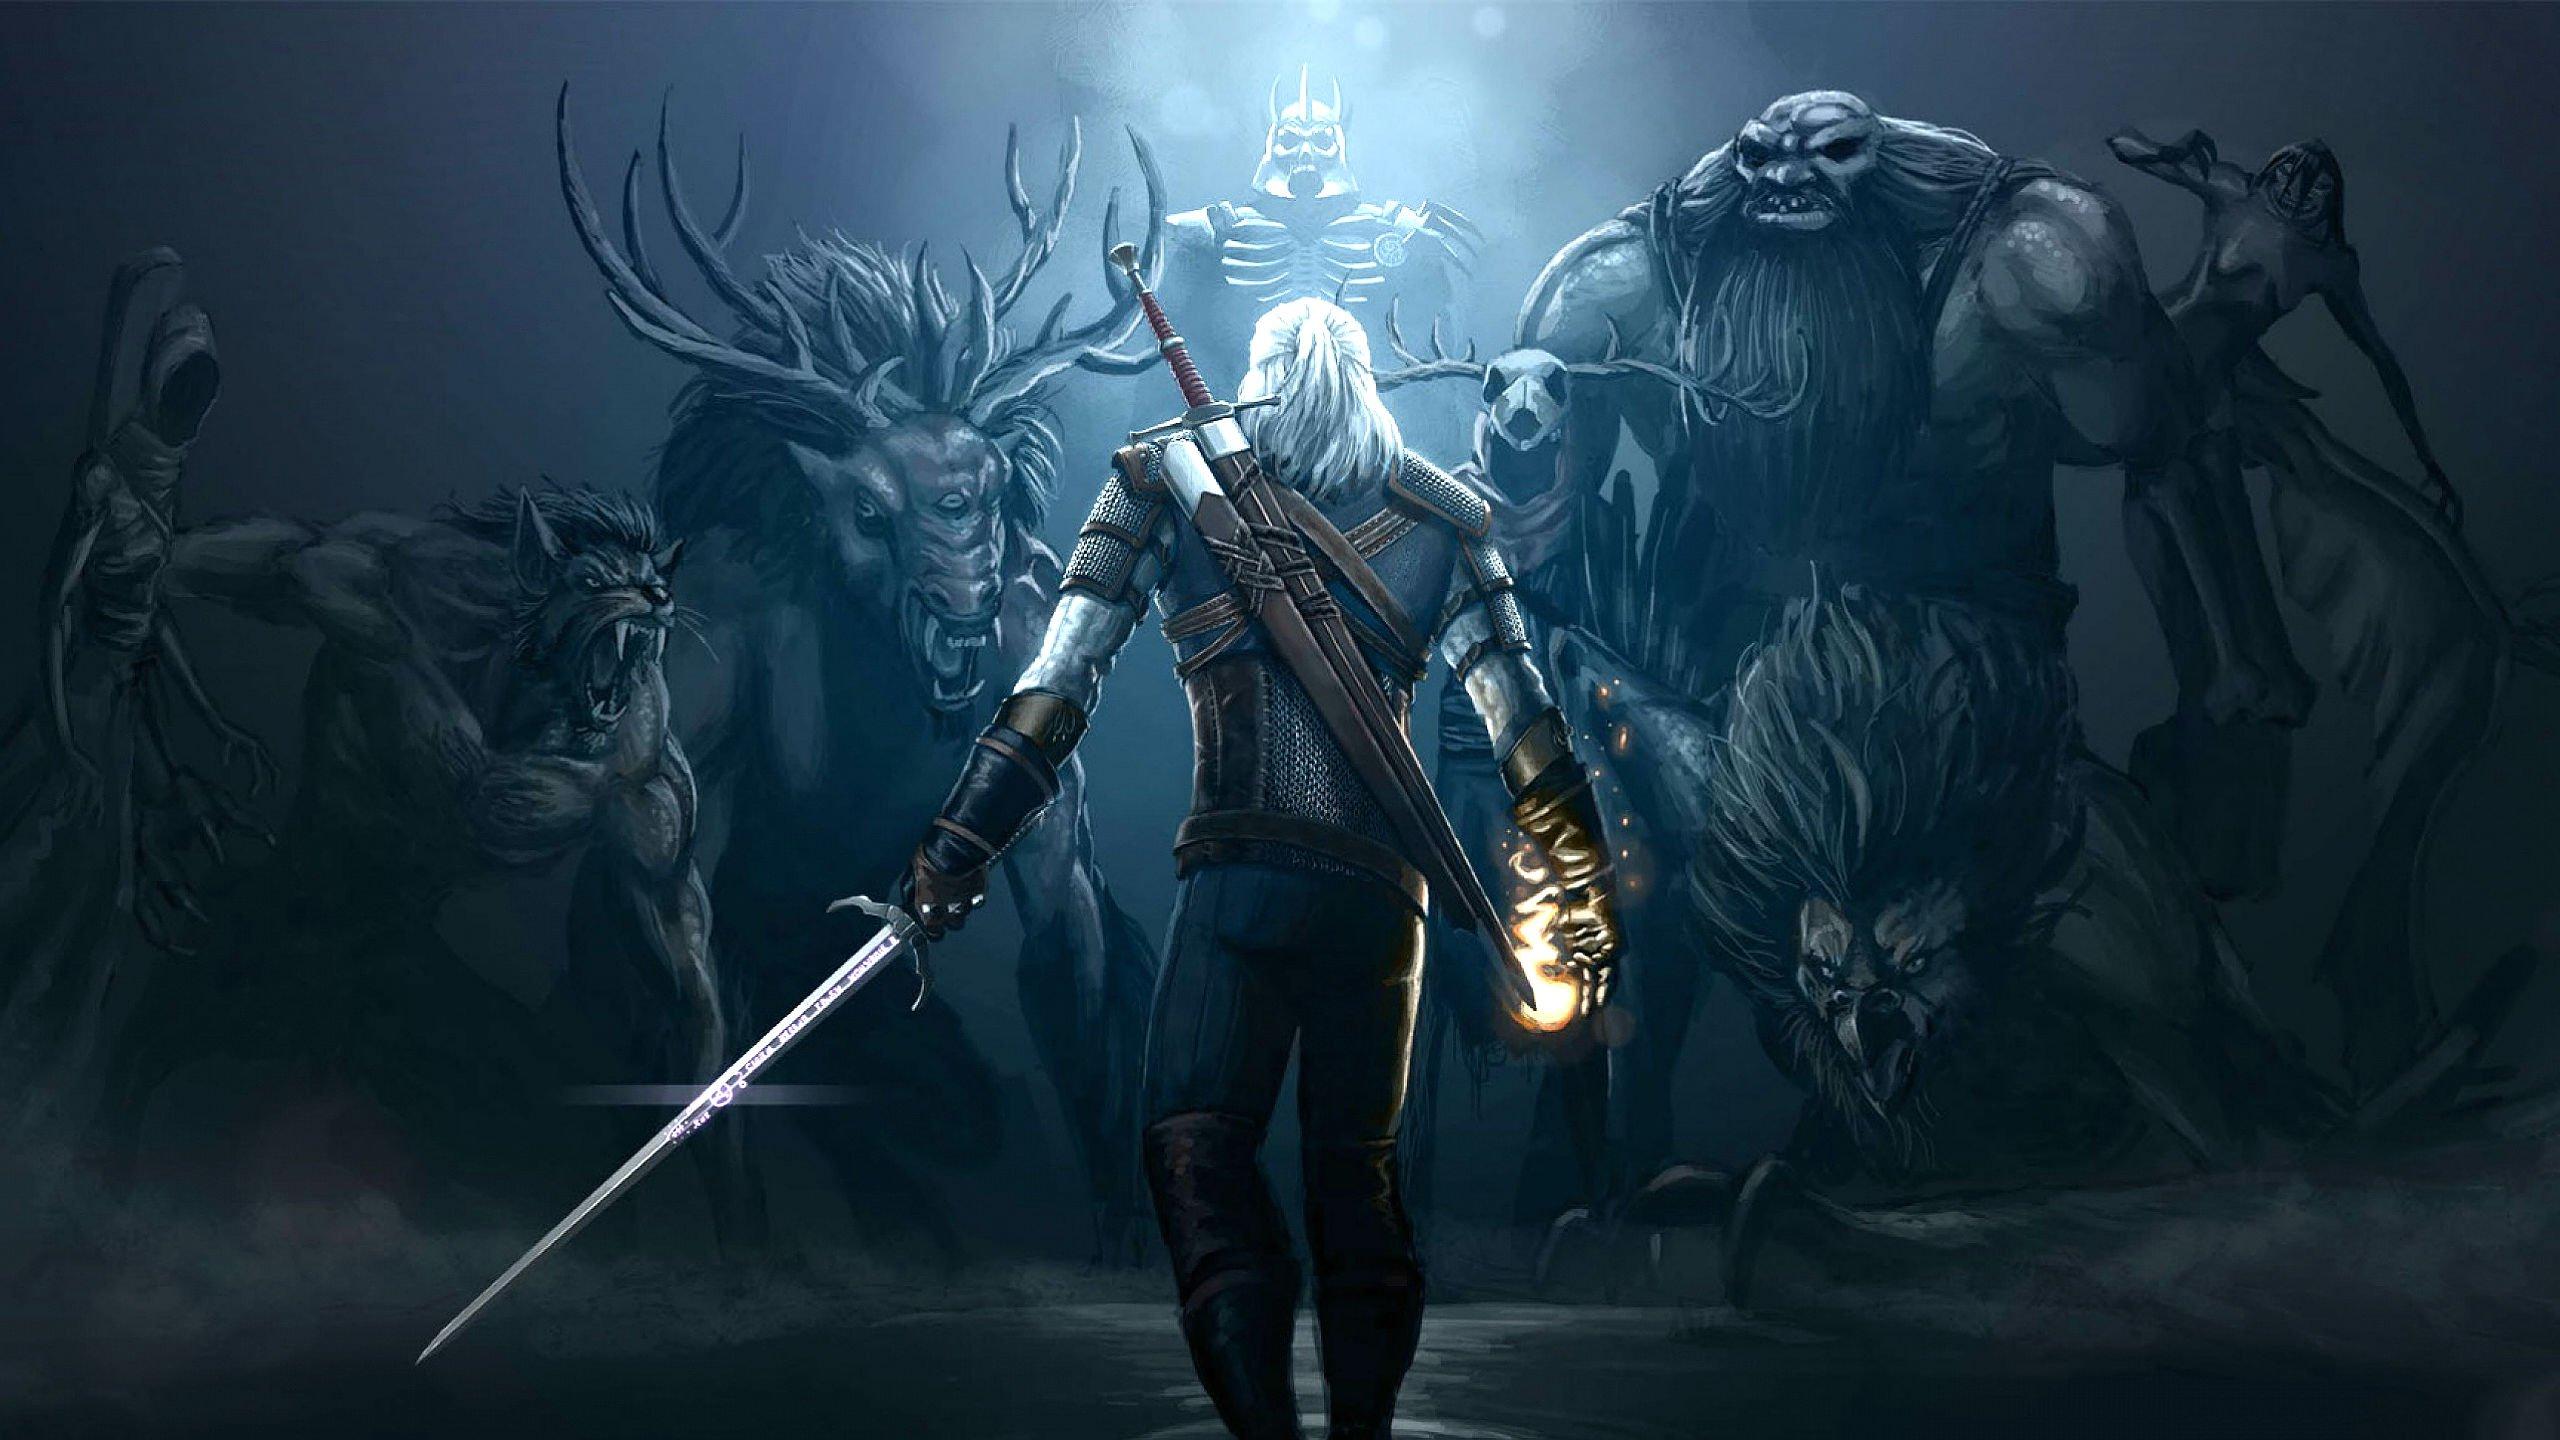 Monster Hunter Girl Wallpaper 1440 Witcher 3 Wild Hunt Fantasy Action Fighting Warrior Dark